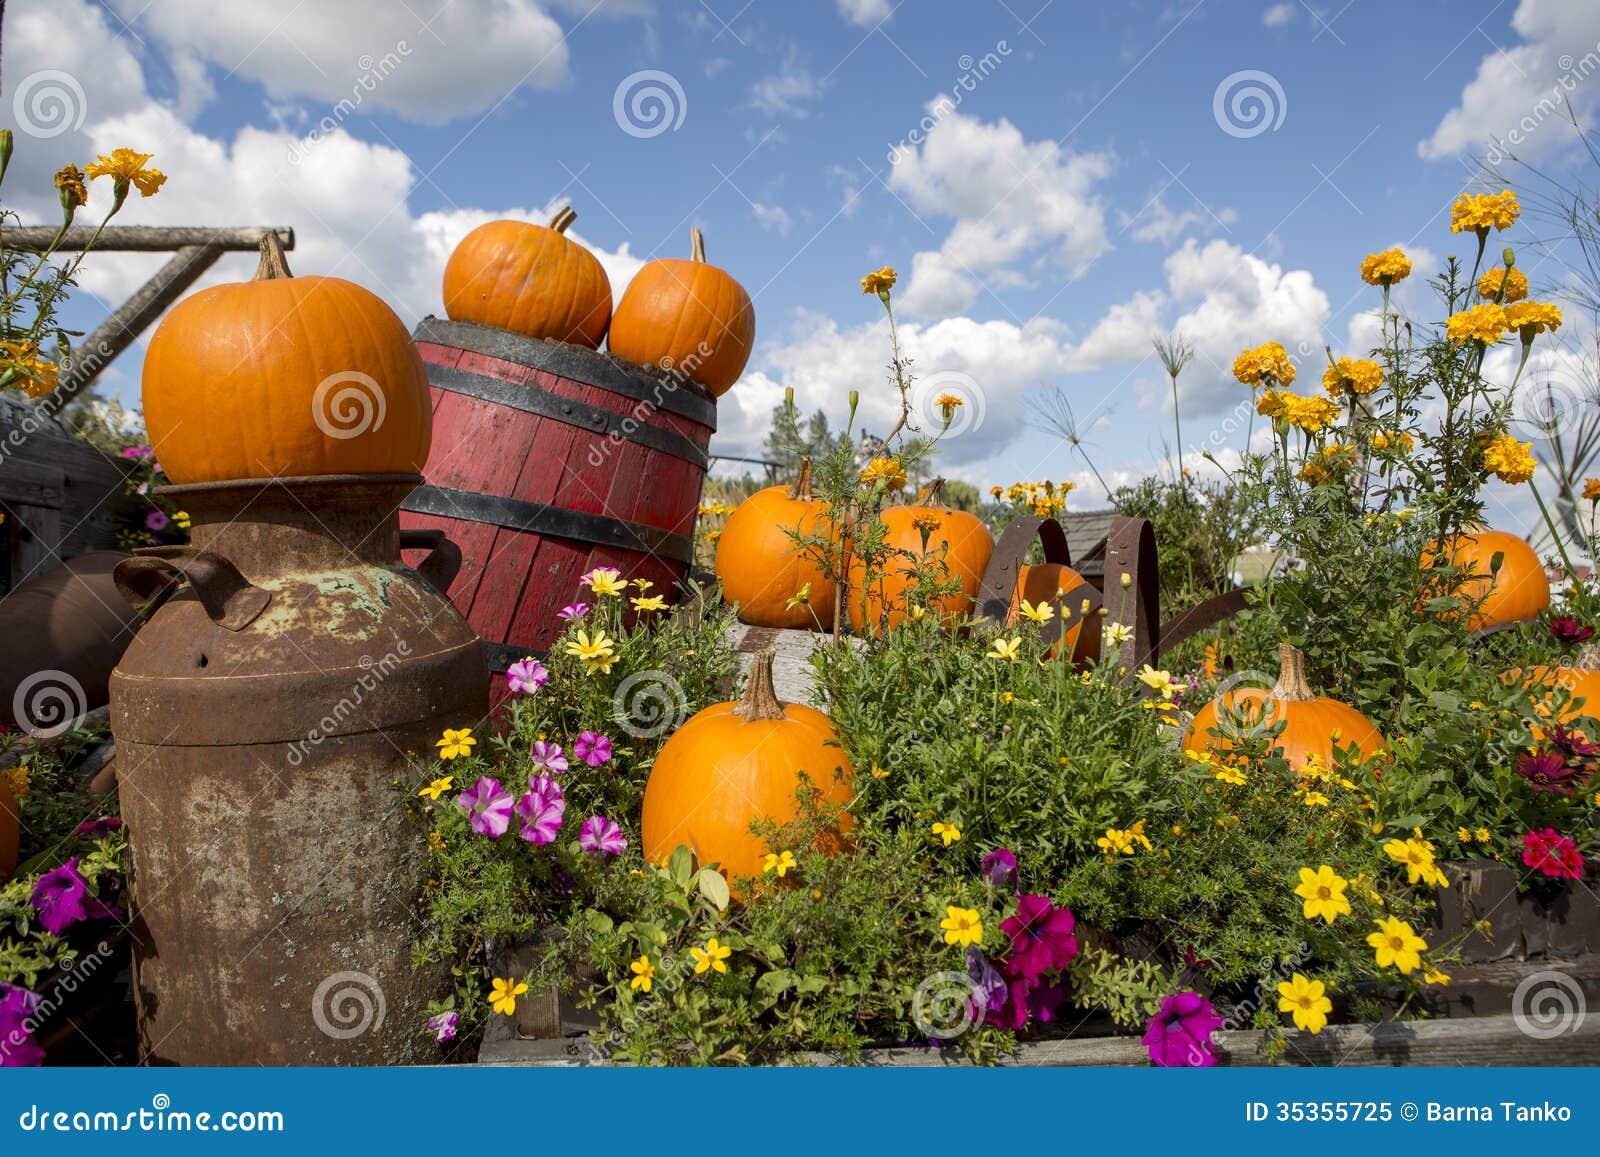 Seasonal garden decorations stock image image 35355725 for Decoration photo